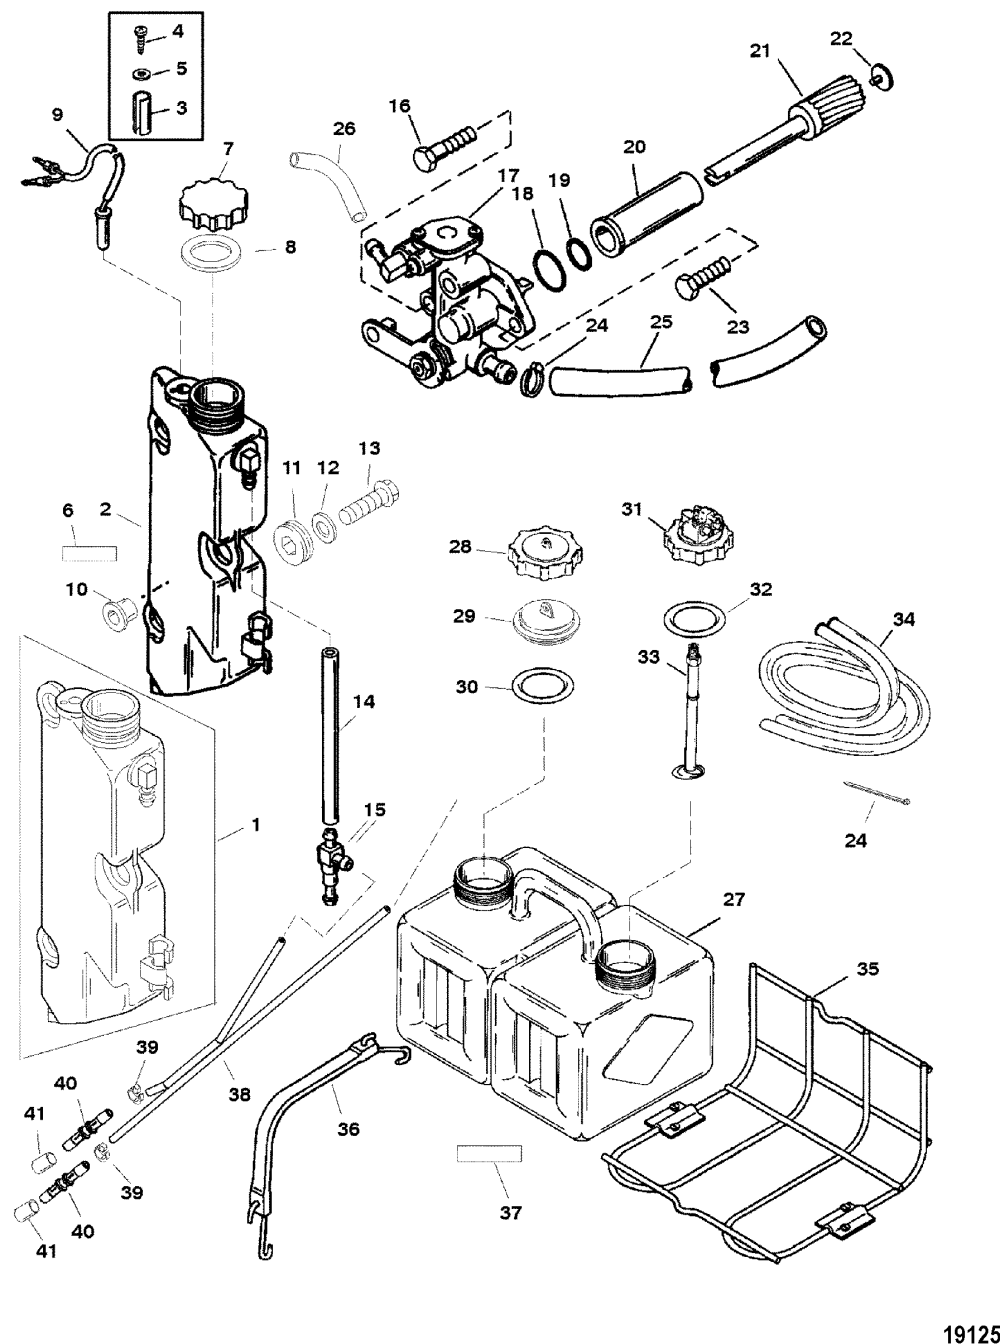 medium resolution of oil injection components for mariner mercury 225 250 3 1998 mercury 225 efi wiring diagram 1999 mercury efi 225